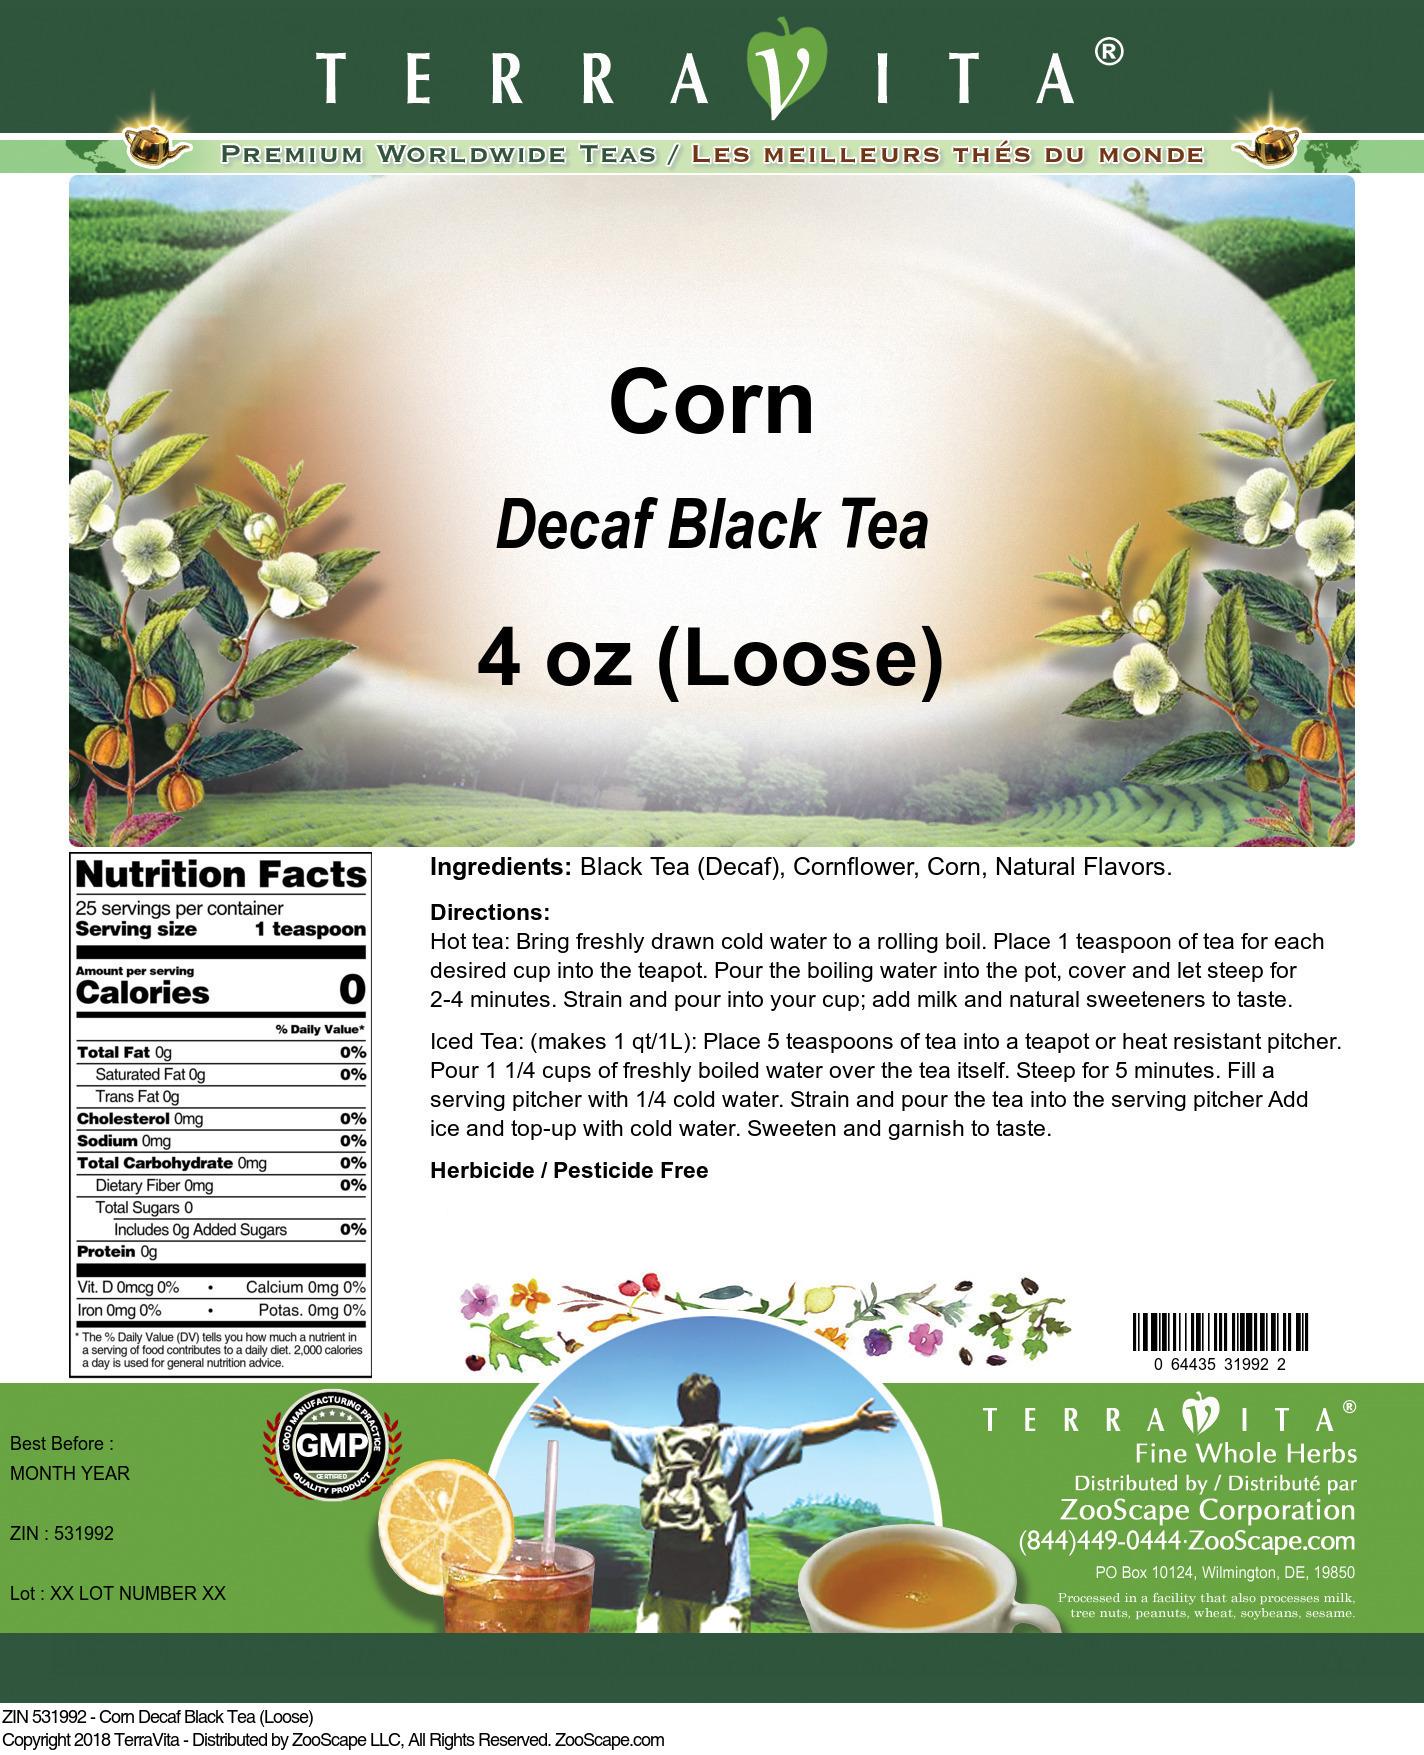 Corn Decaf Black Tea (Loose)